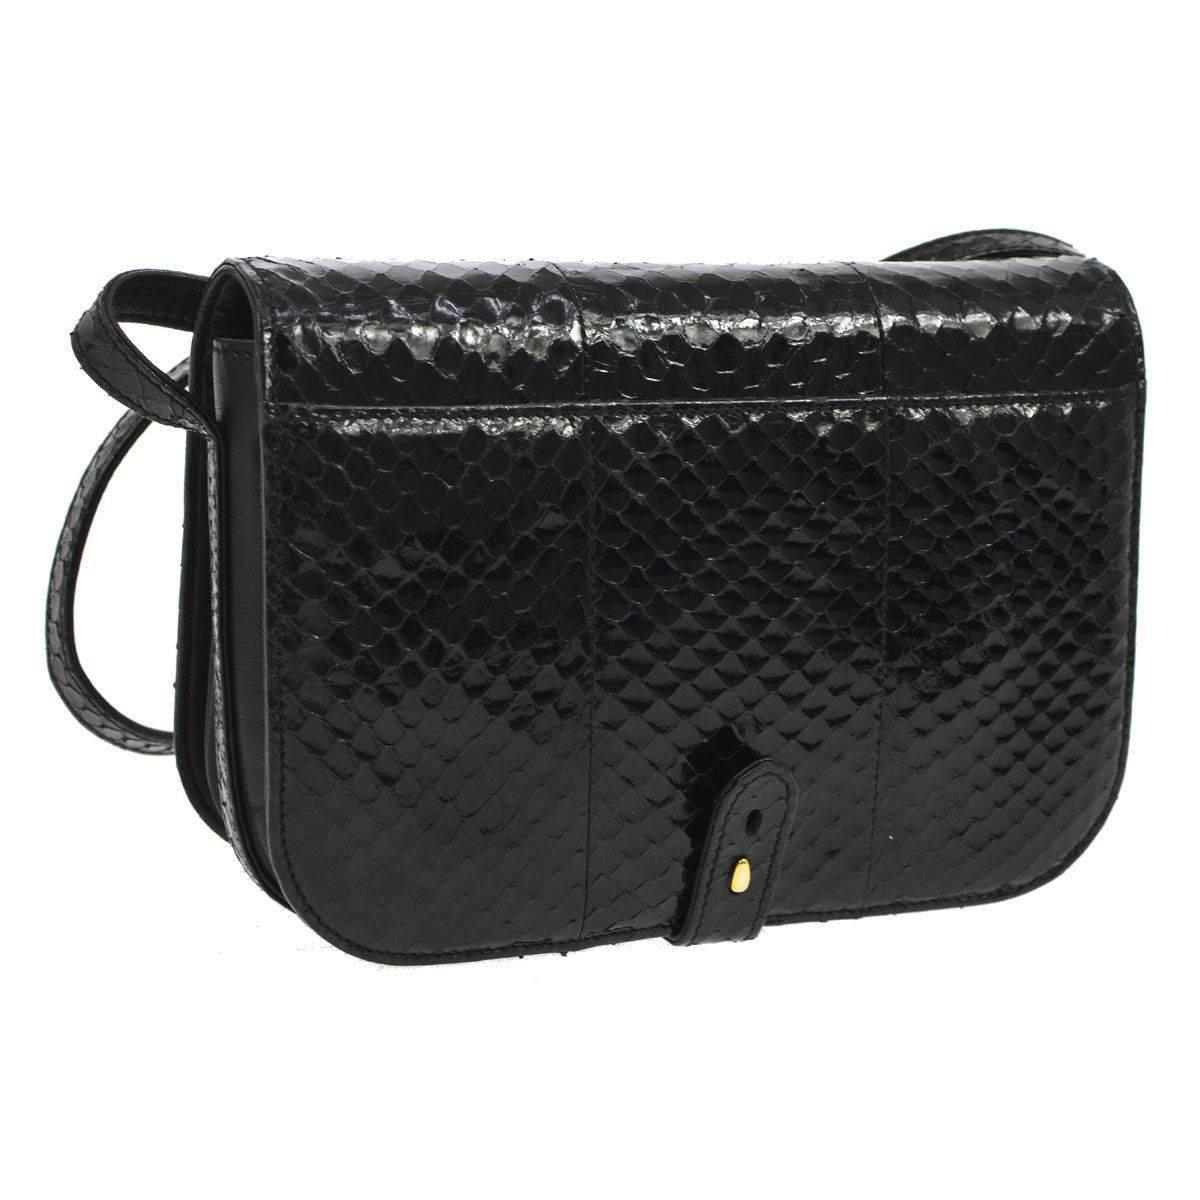 Gucci Black Snakeskin Leather Gold Evening Saddle Crossbody Shoulder Flap Bag hQfW02